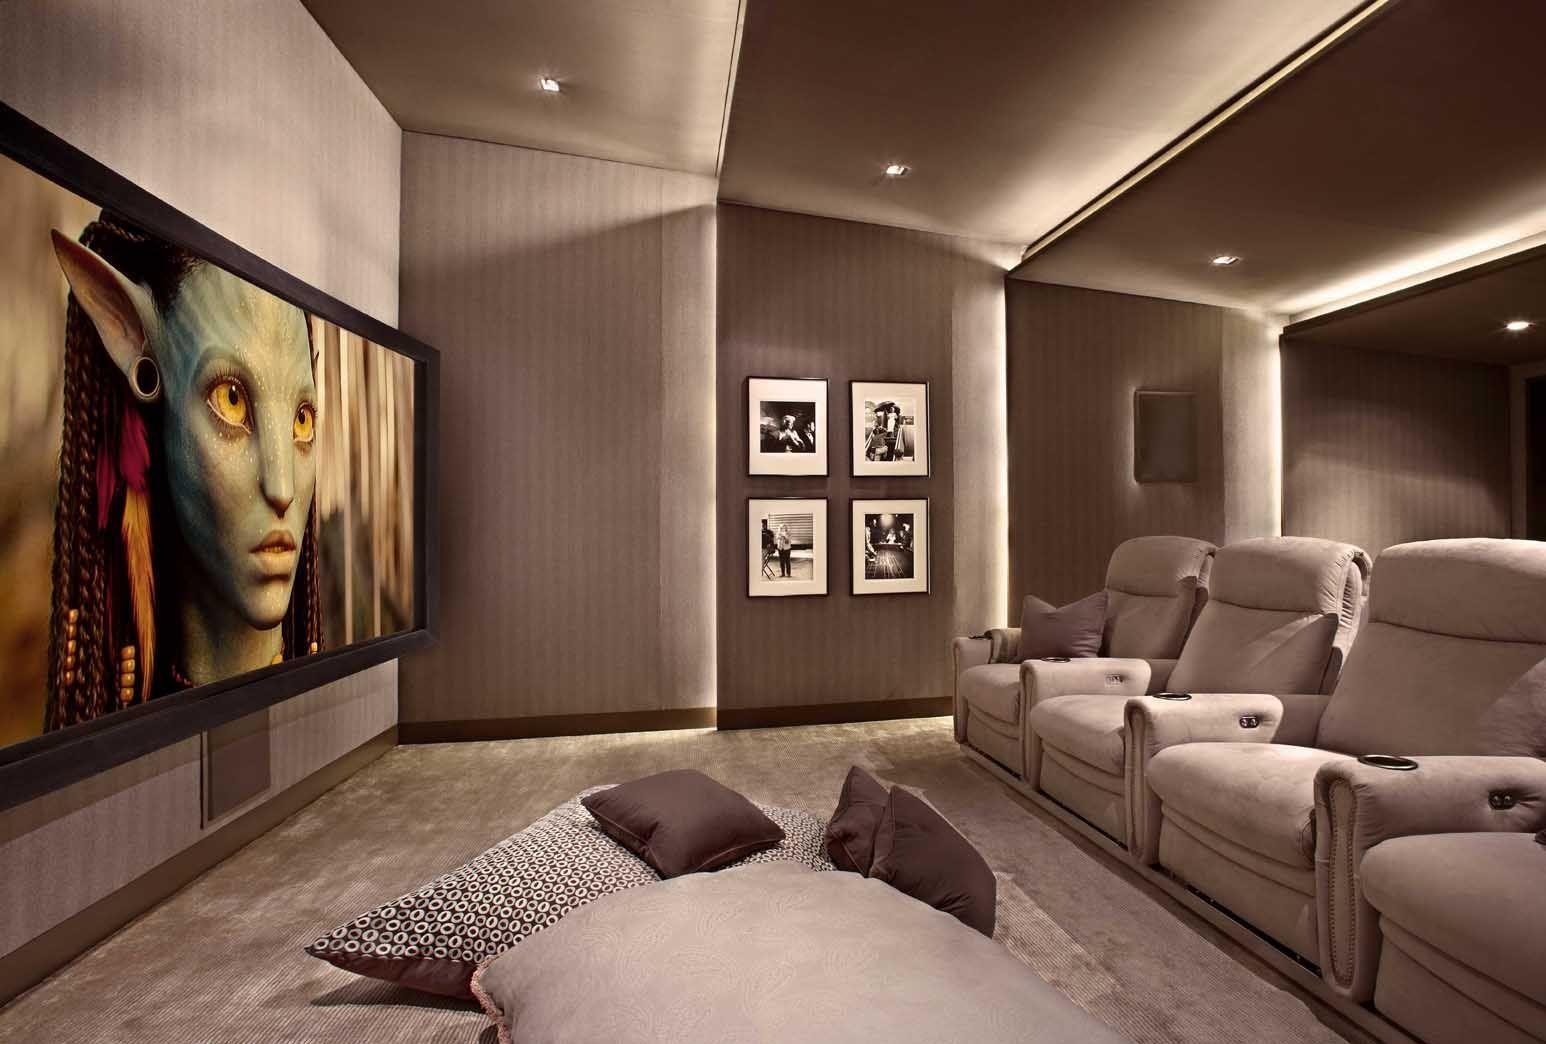 Lower Storey Cinema Room Hometheater Projector Home Theatre